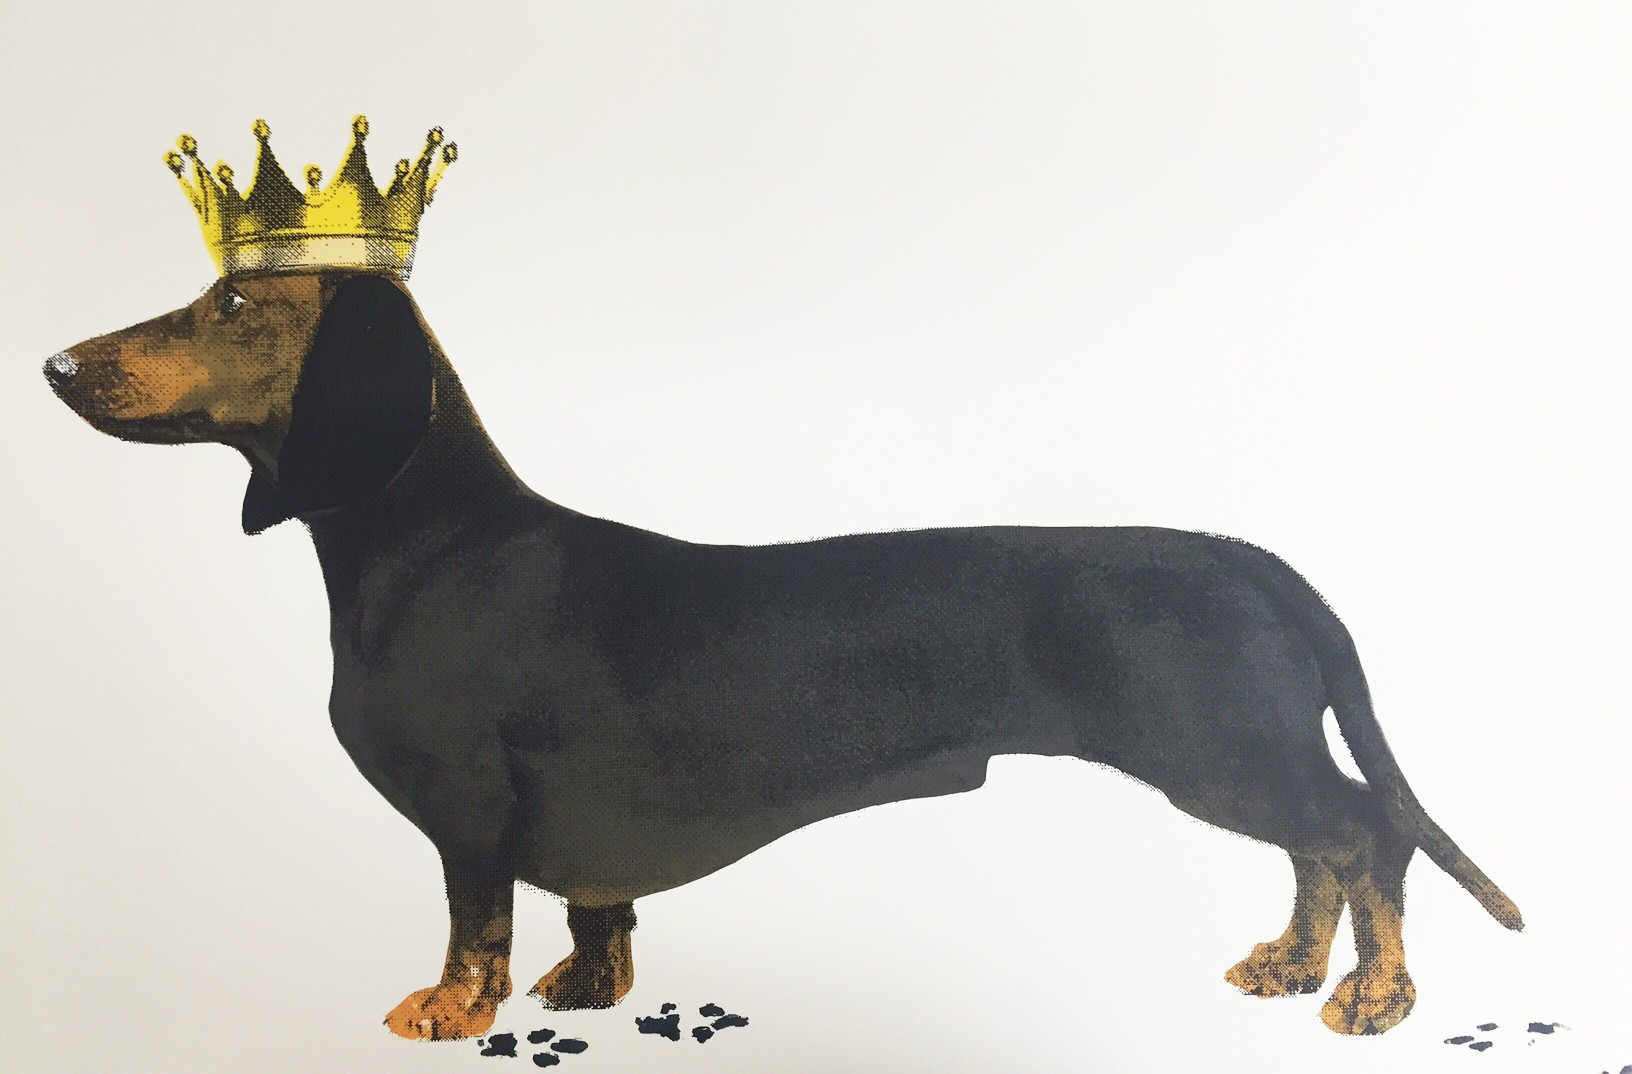 Royal Sausage, black and tan